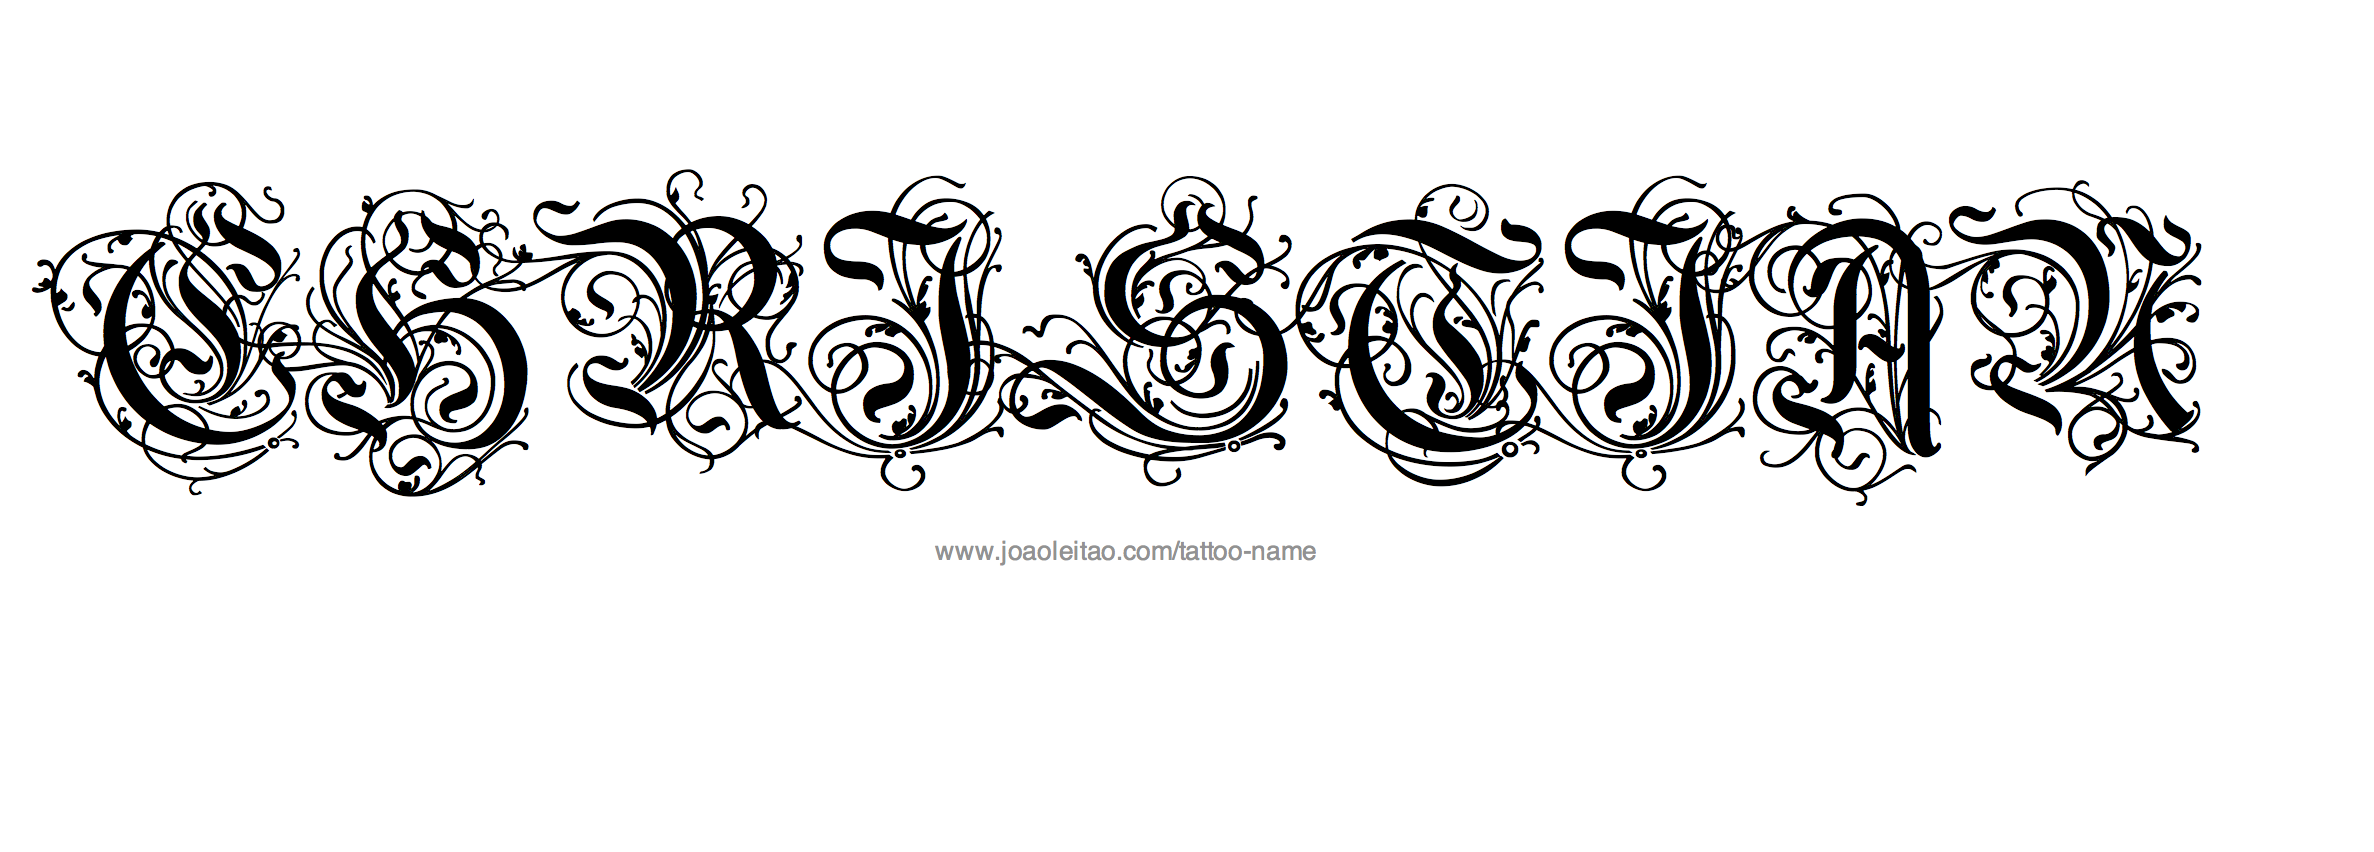 Christian Name Tattoo Designs